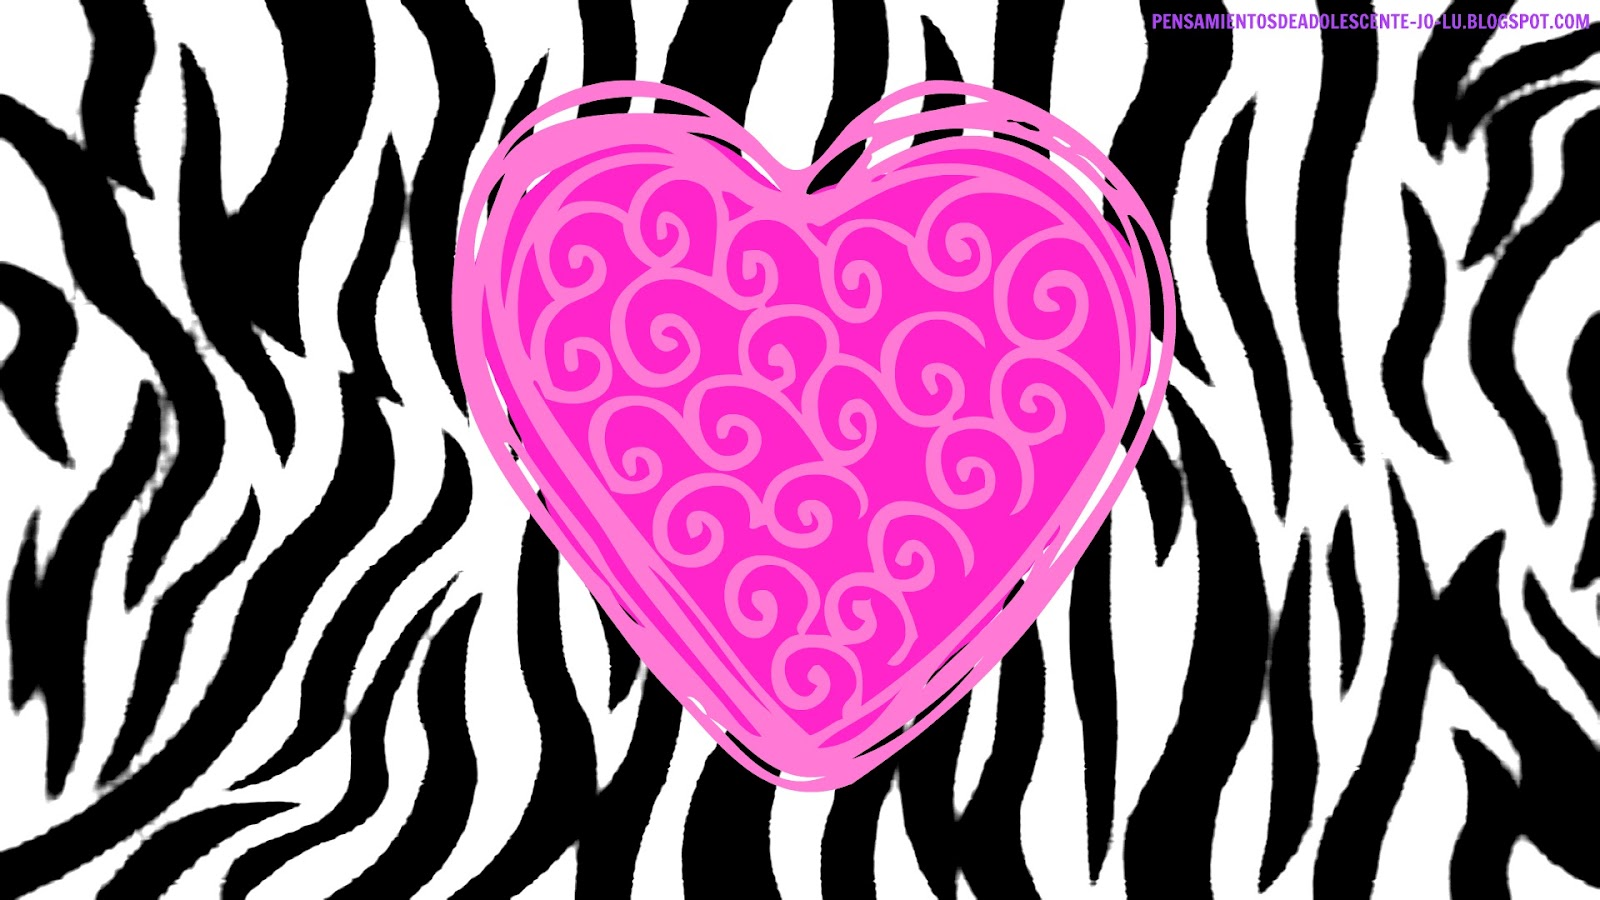 Great Wallpaper Hello Kitty Zebra - e5X0xd  Image_447988.jpg